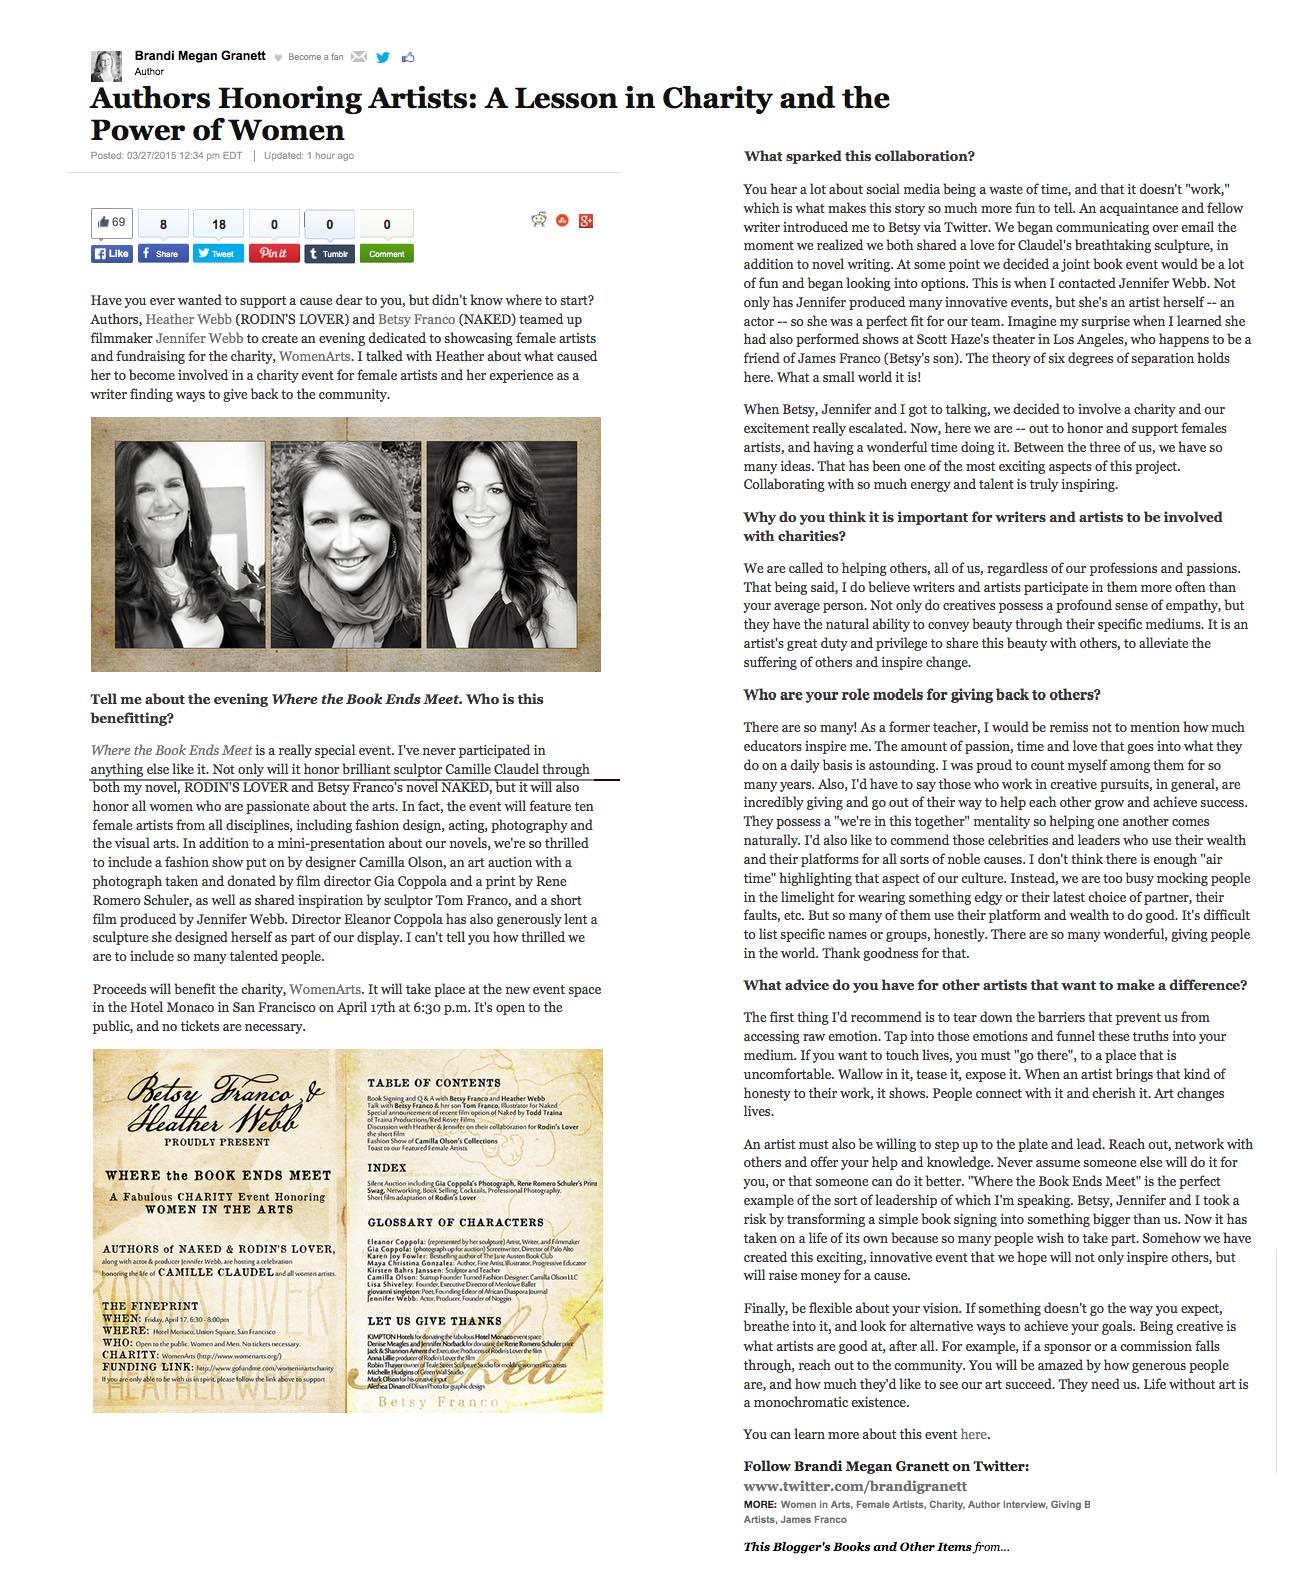 Huffington Post: Authors Honoring Women